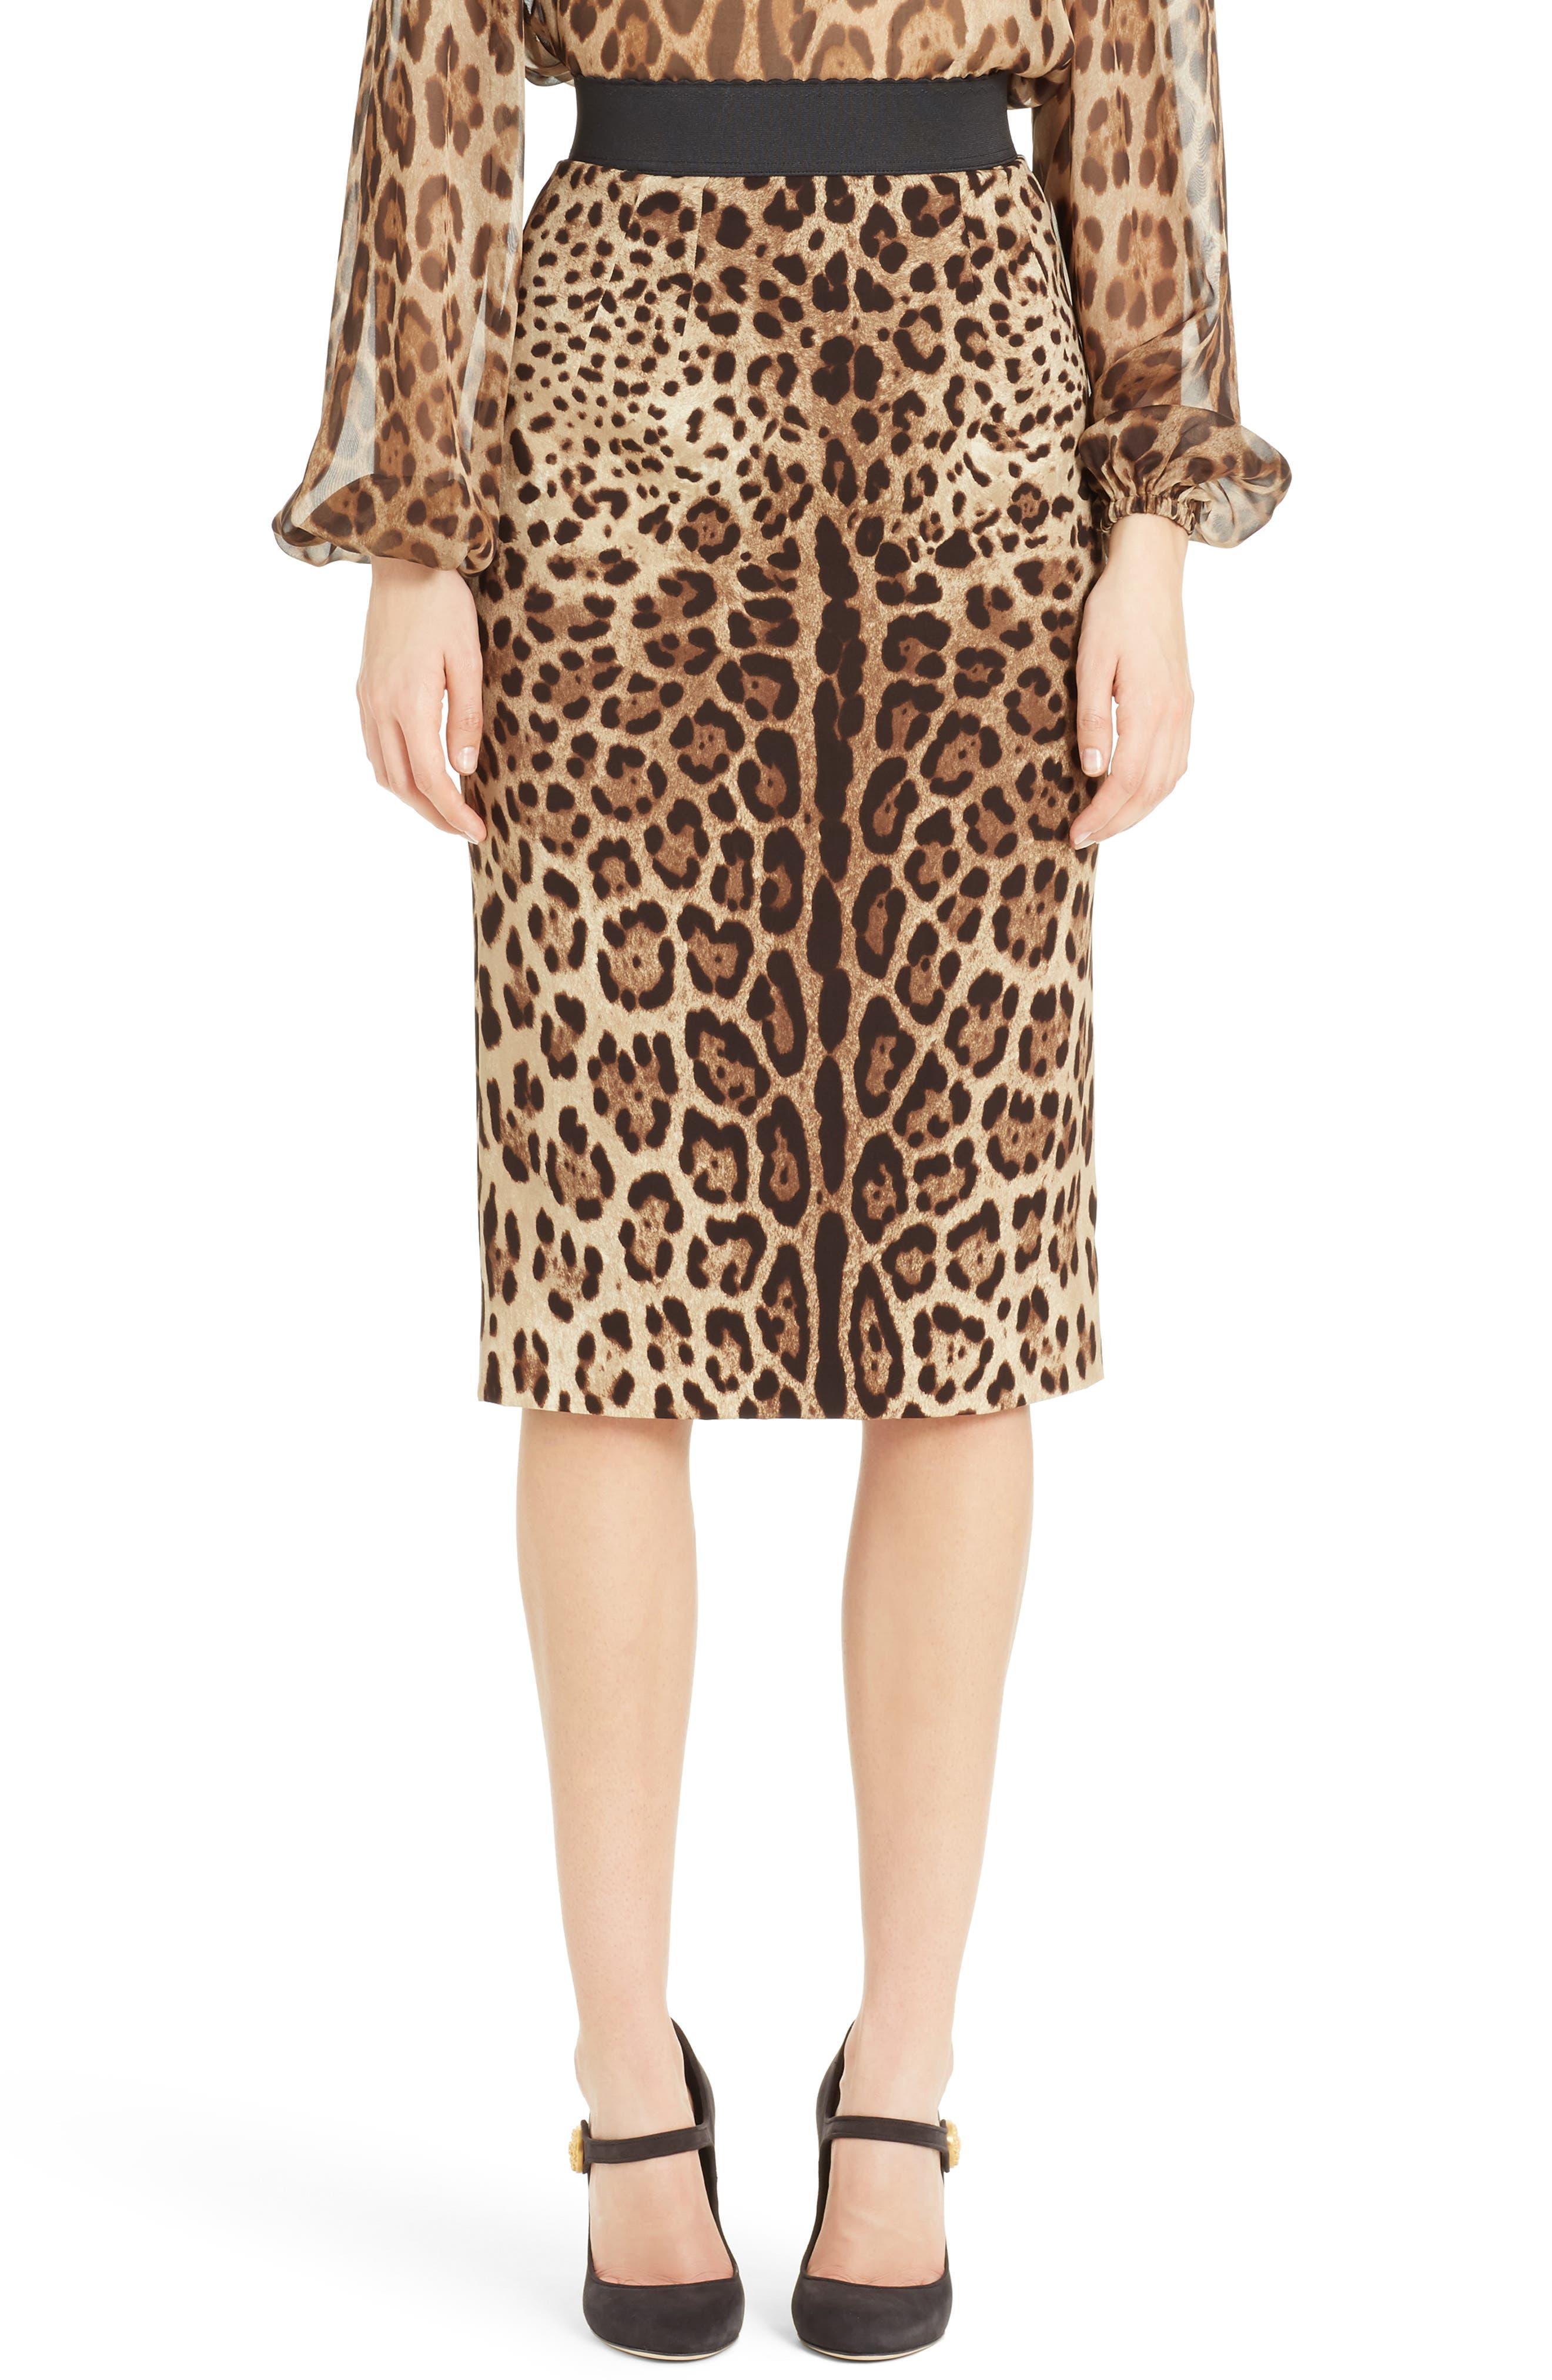 Dolce&Gabbana Leopard Print Stretch Silk Pencil Skirt